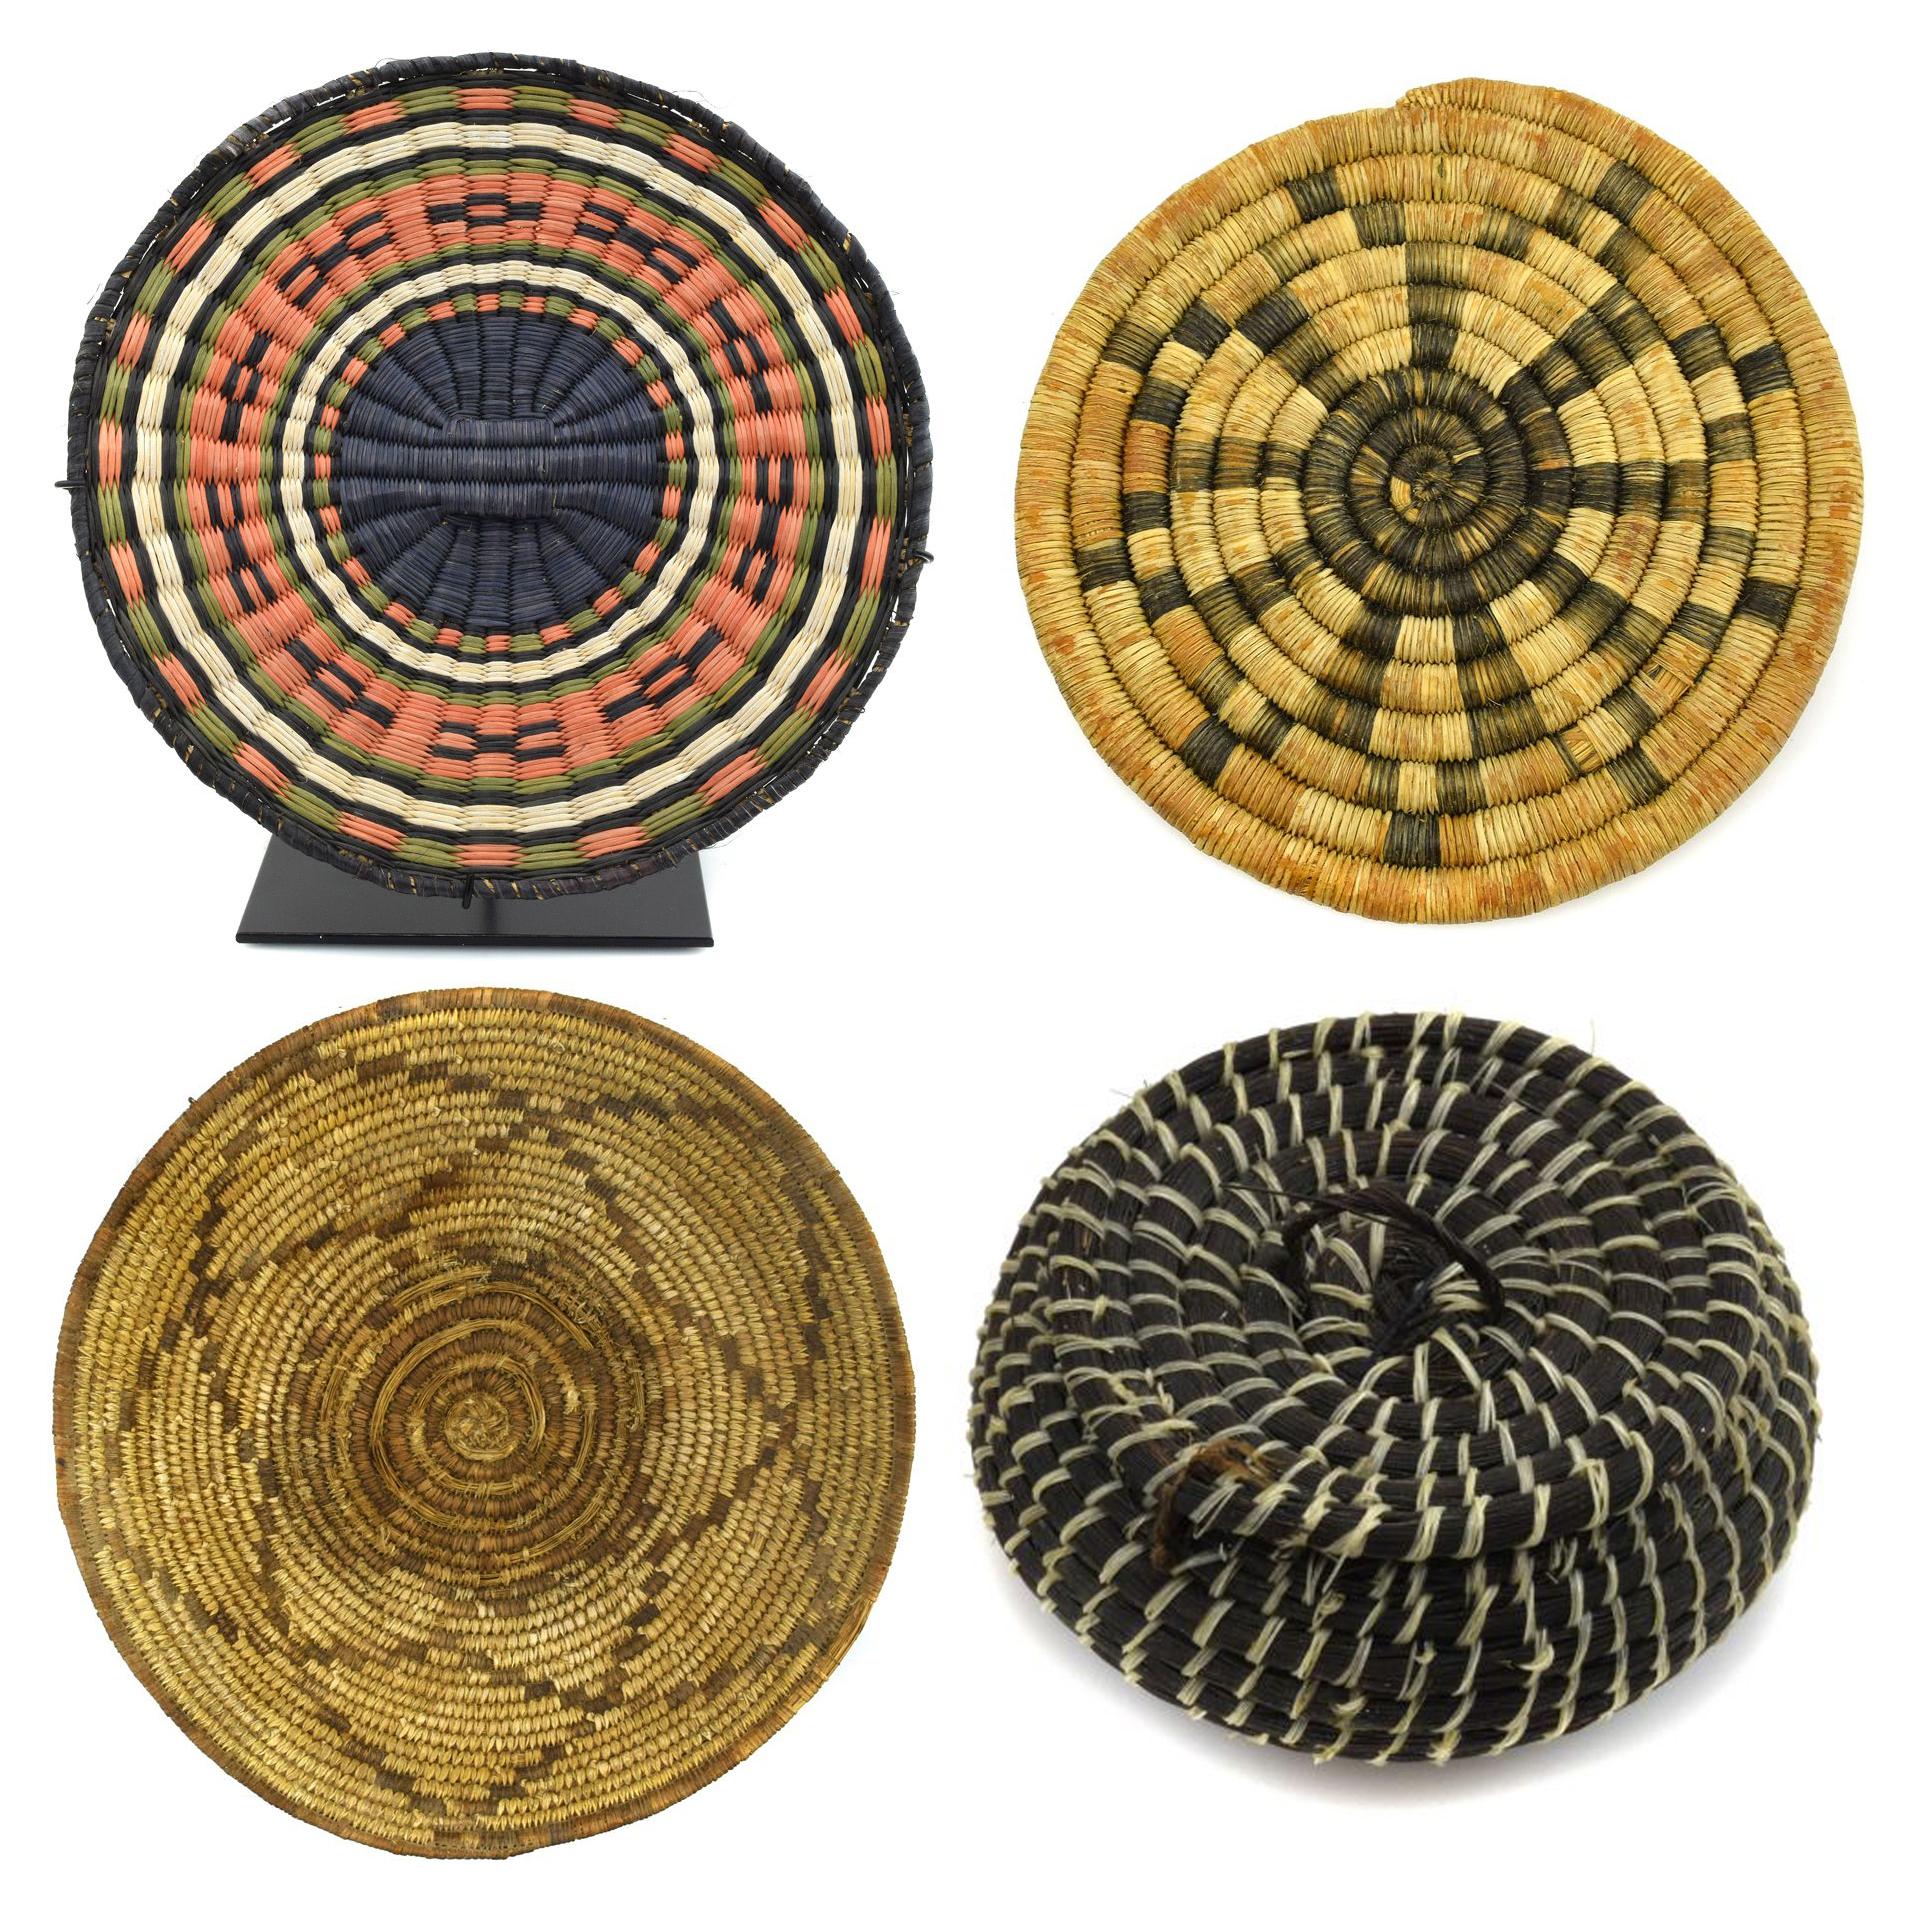 Featurette - Over 40 Baskets for Sale, Tohono O'odham, Hopi, Apache, Pima, Havasupai, and Paiute